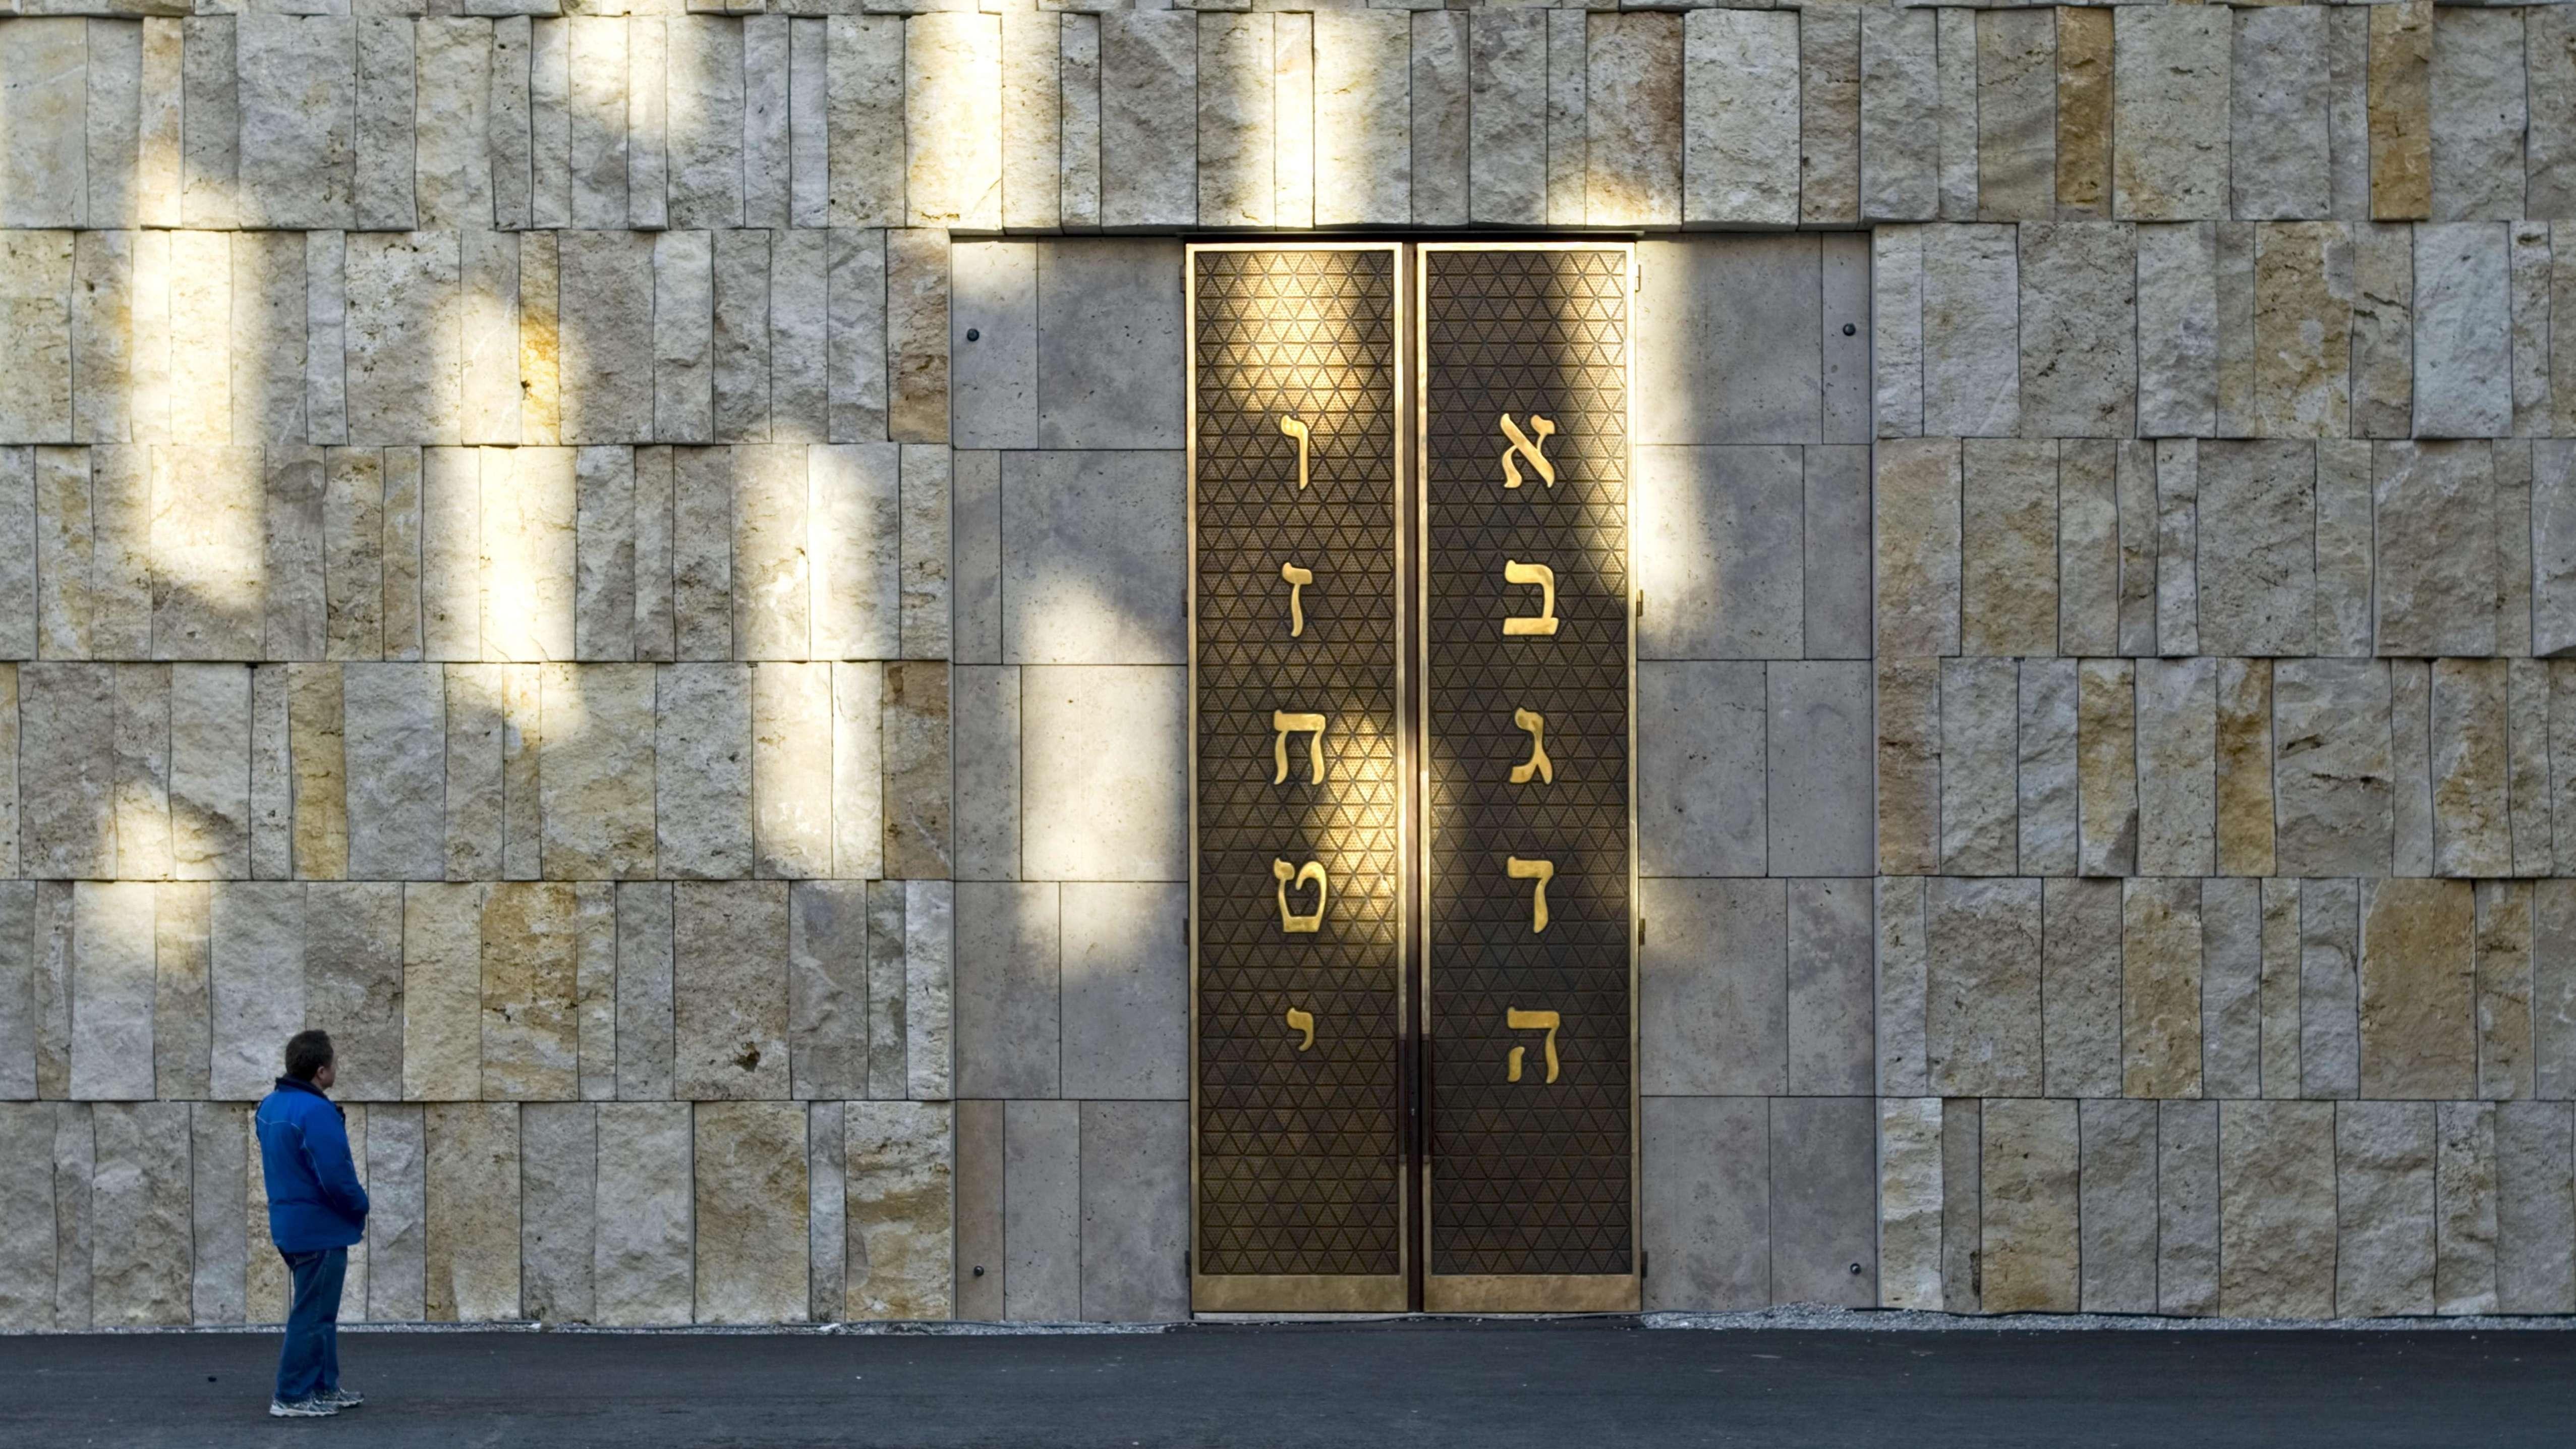 Die Hauptsynagoge Ohel Jakob am St.-Jakobs-Platz in München.